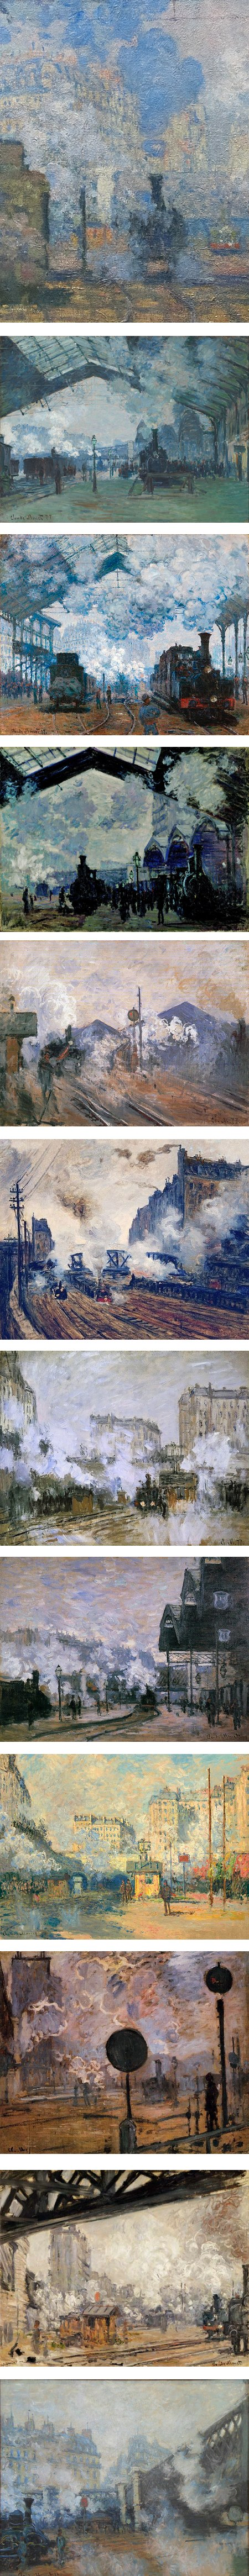 Claude Monet Gare Saint Lazare : claude, monet, saint, lazare, Monet's, Saint-Lazare, Series, Lines, Colors